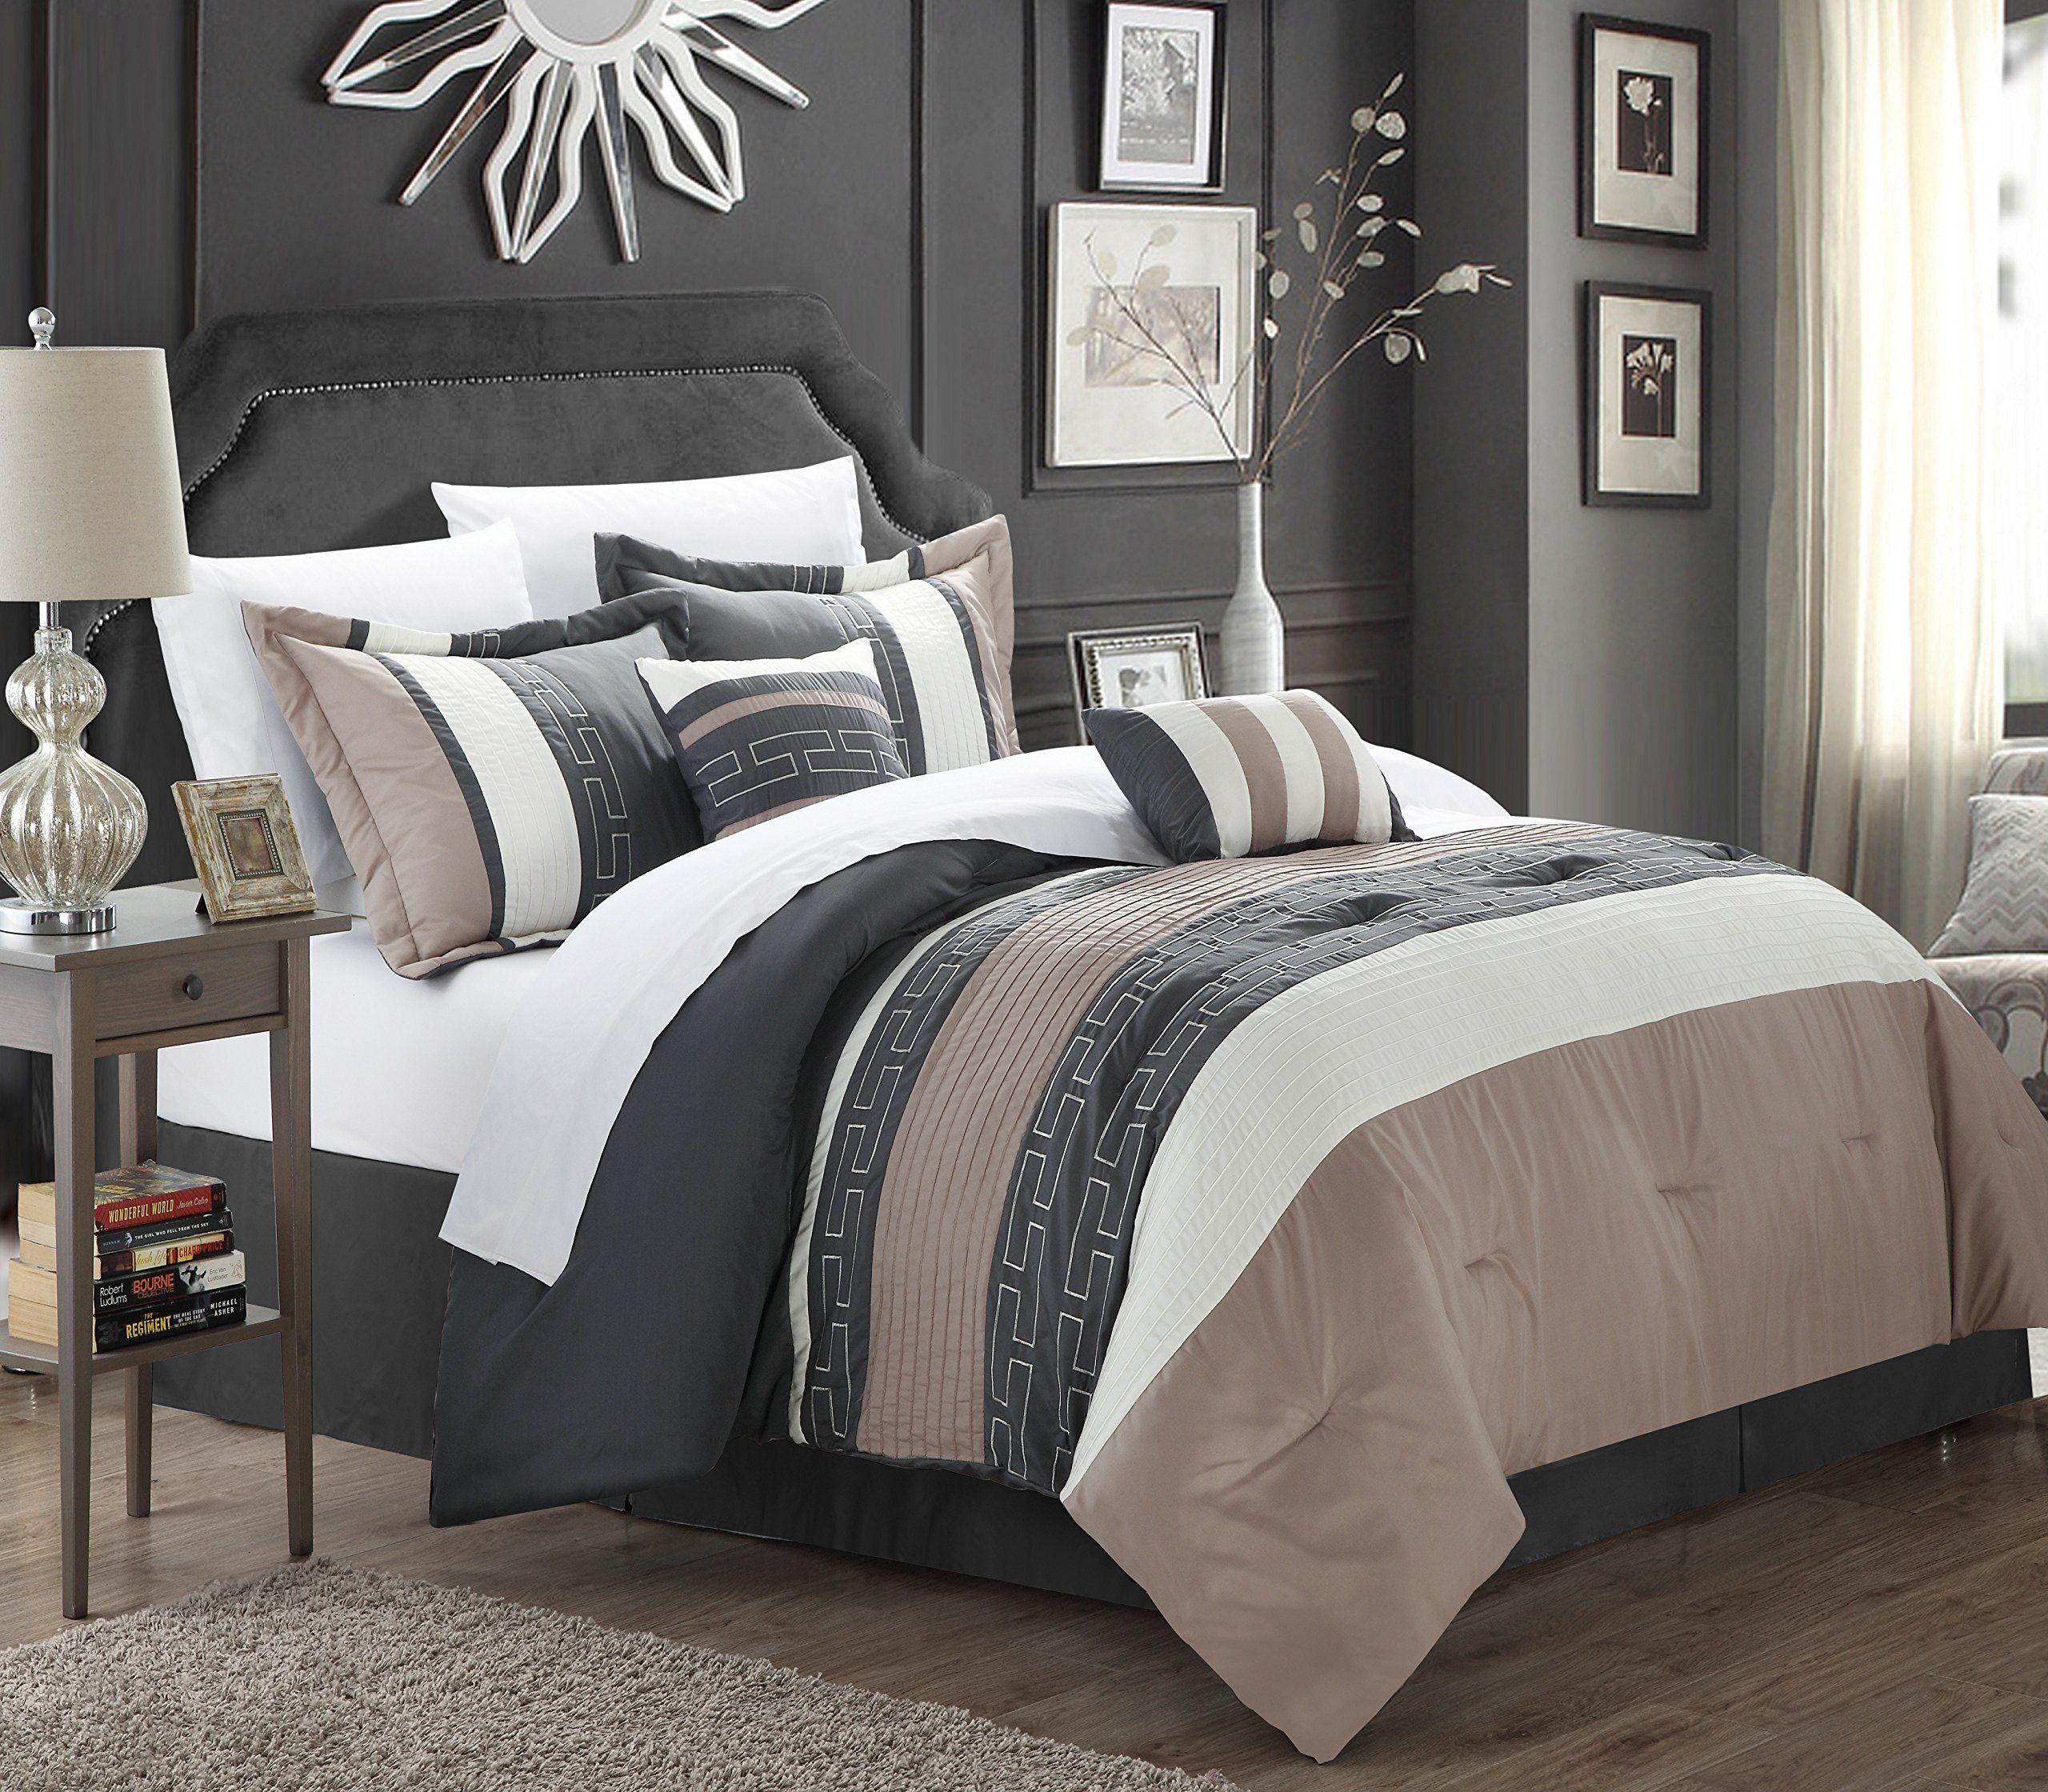 amazon com chic home carlton 6 piece comforter set king size